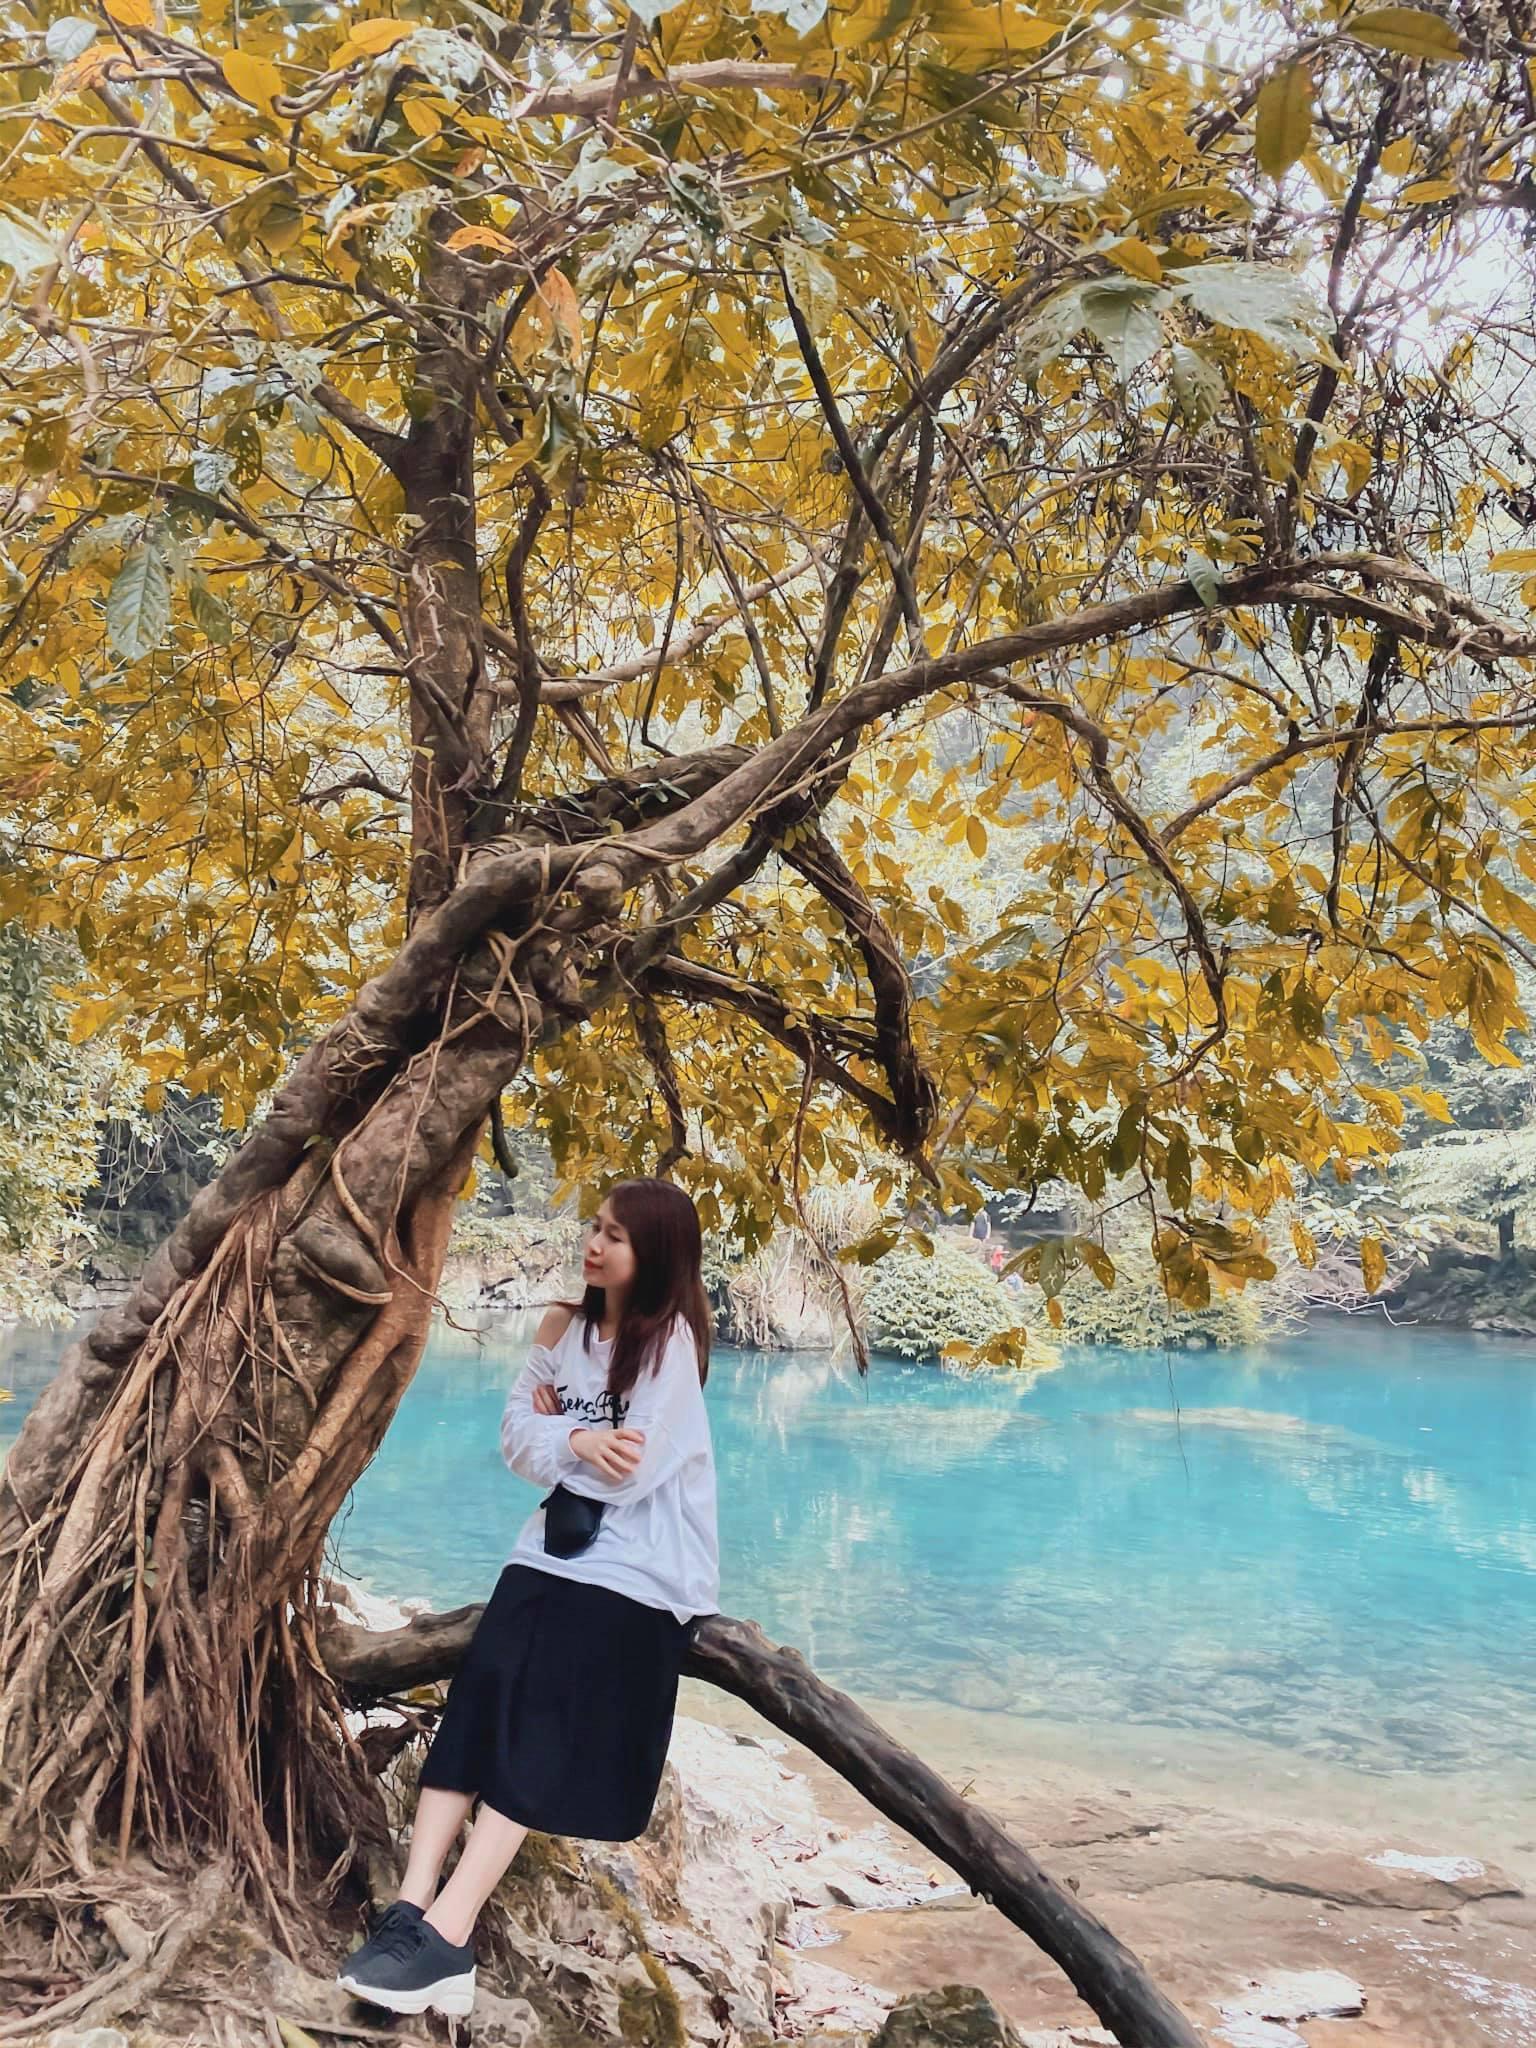 Tong-hop-nhung-dia-diem-du-lich-nui-hot-nhat-trong-dip-30-thang-4-vietmountain-travel1121